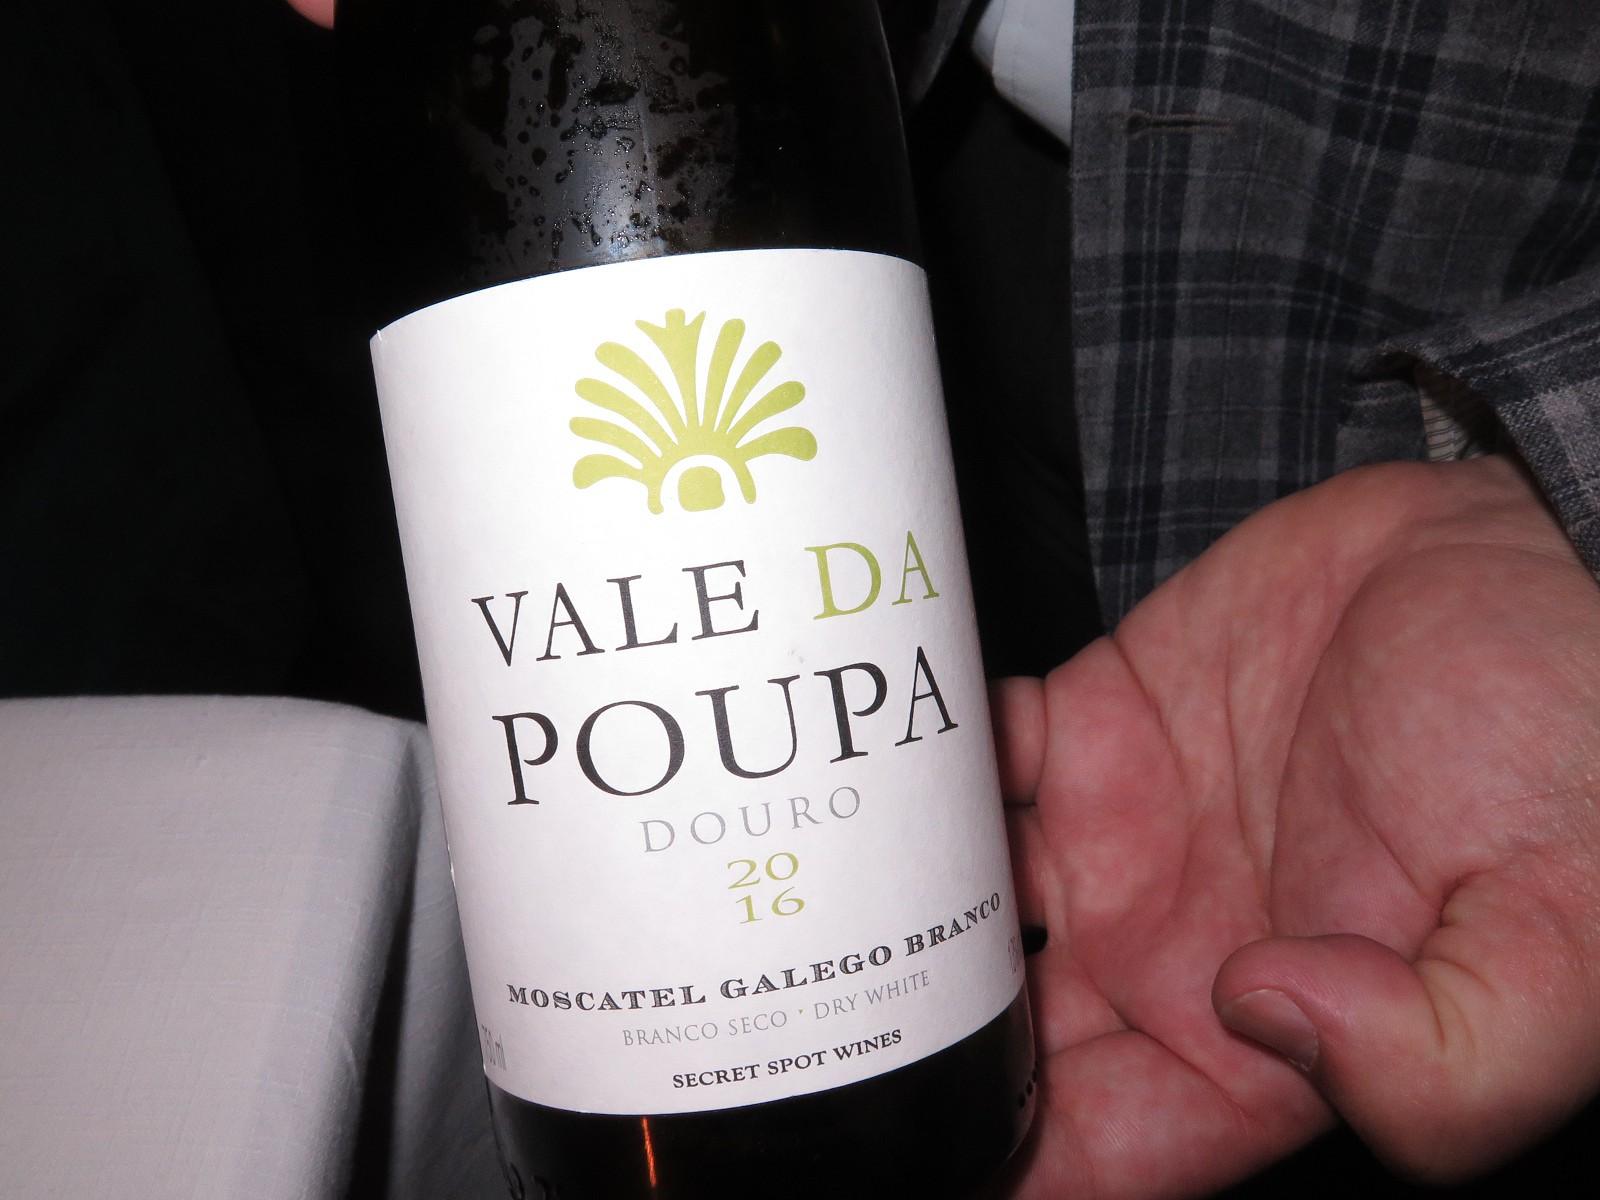 Vale da Poupa Moscatel Galego Branco 2016